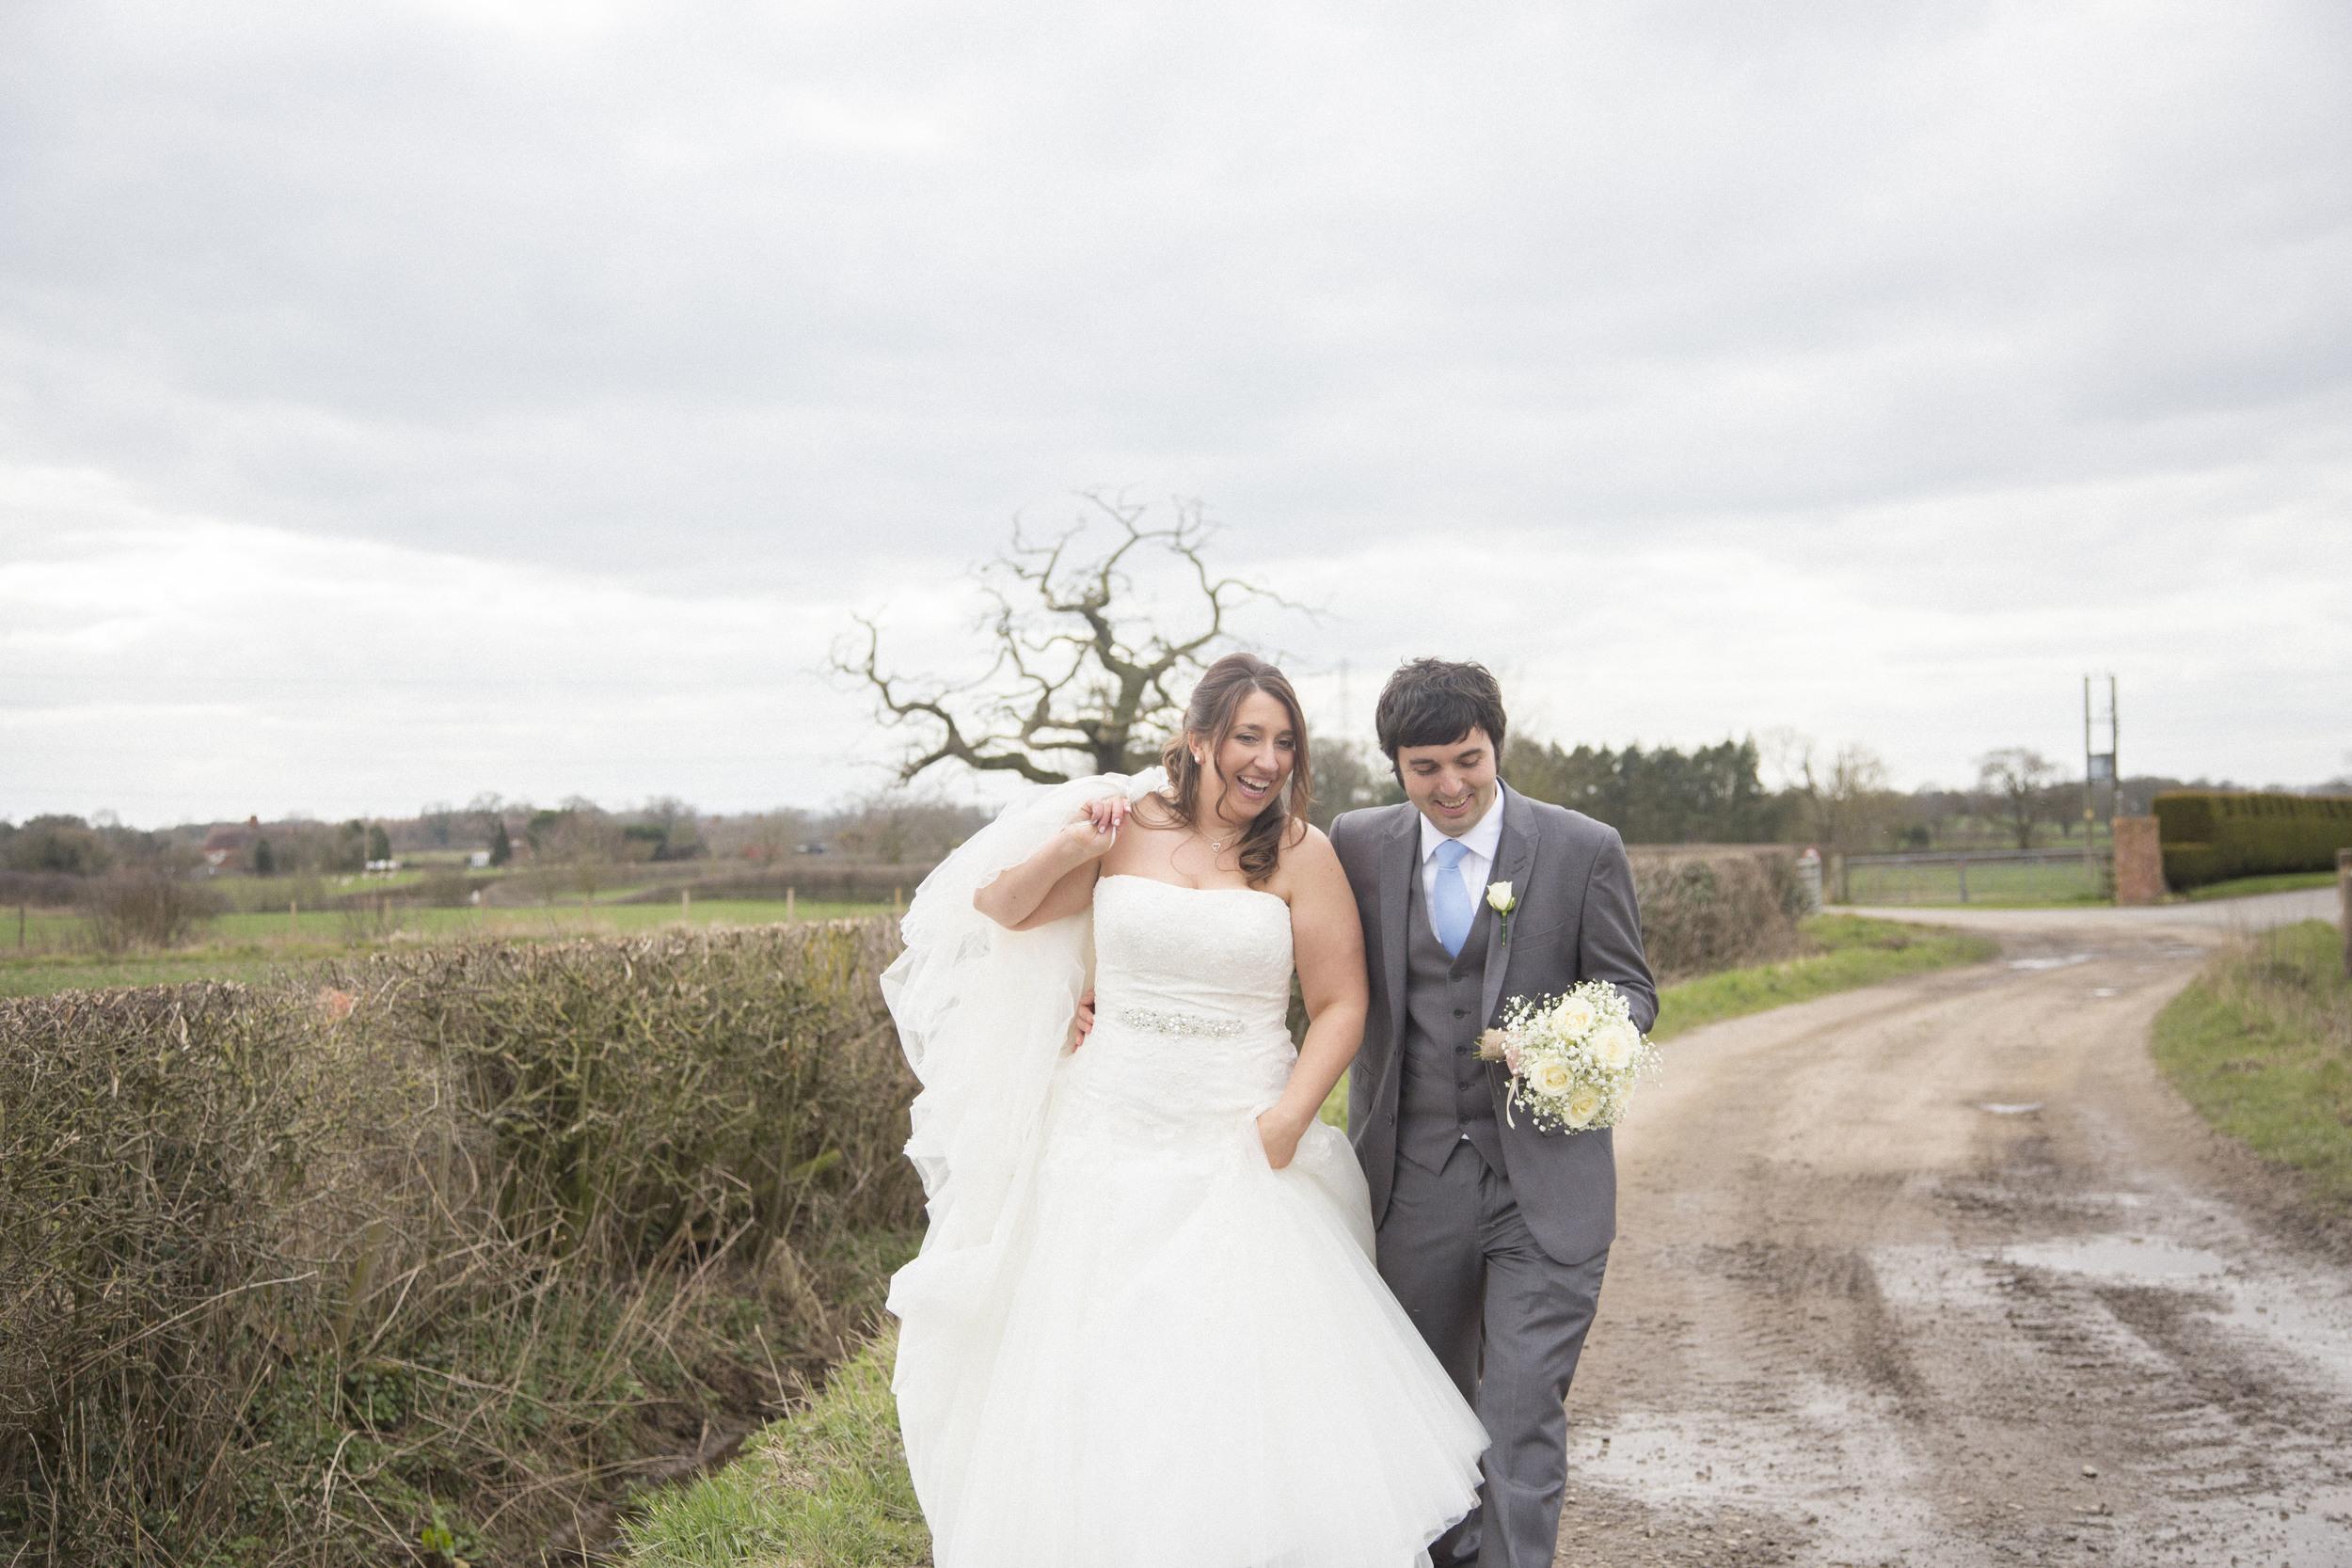 Ellie+Rob-Albright-Hussey-Wedding-233.jpg